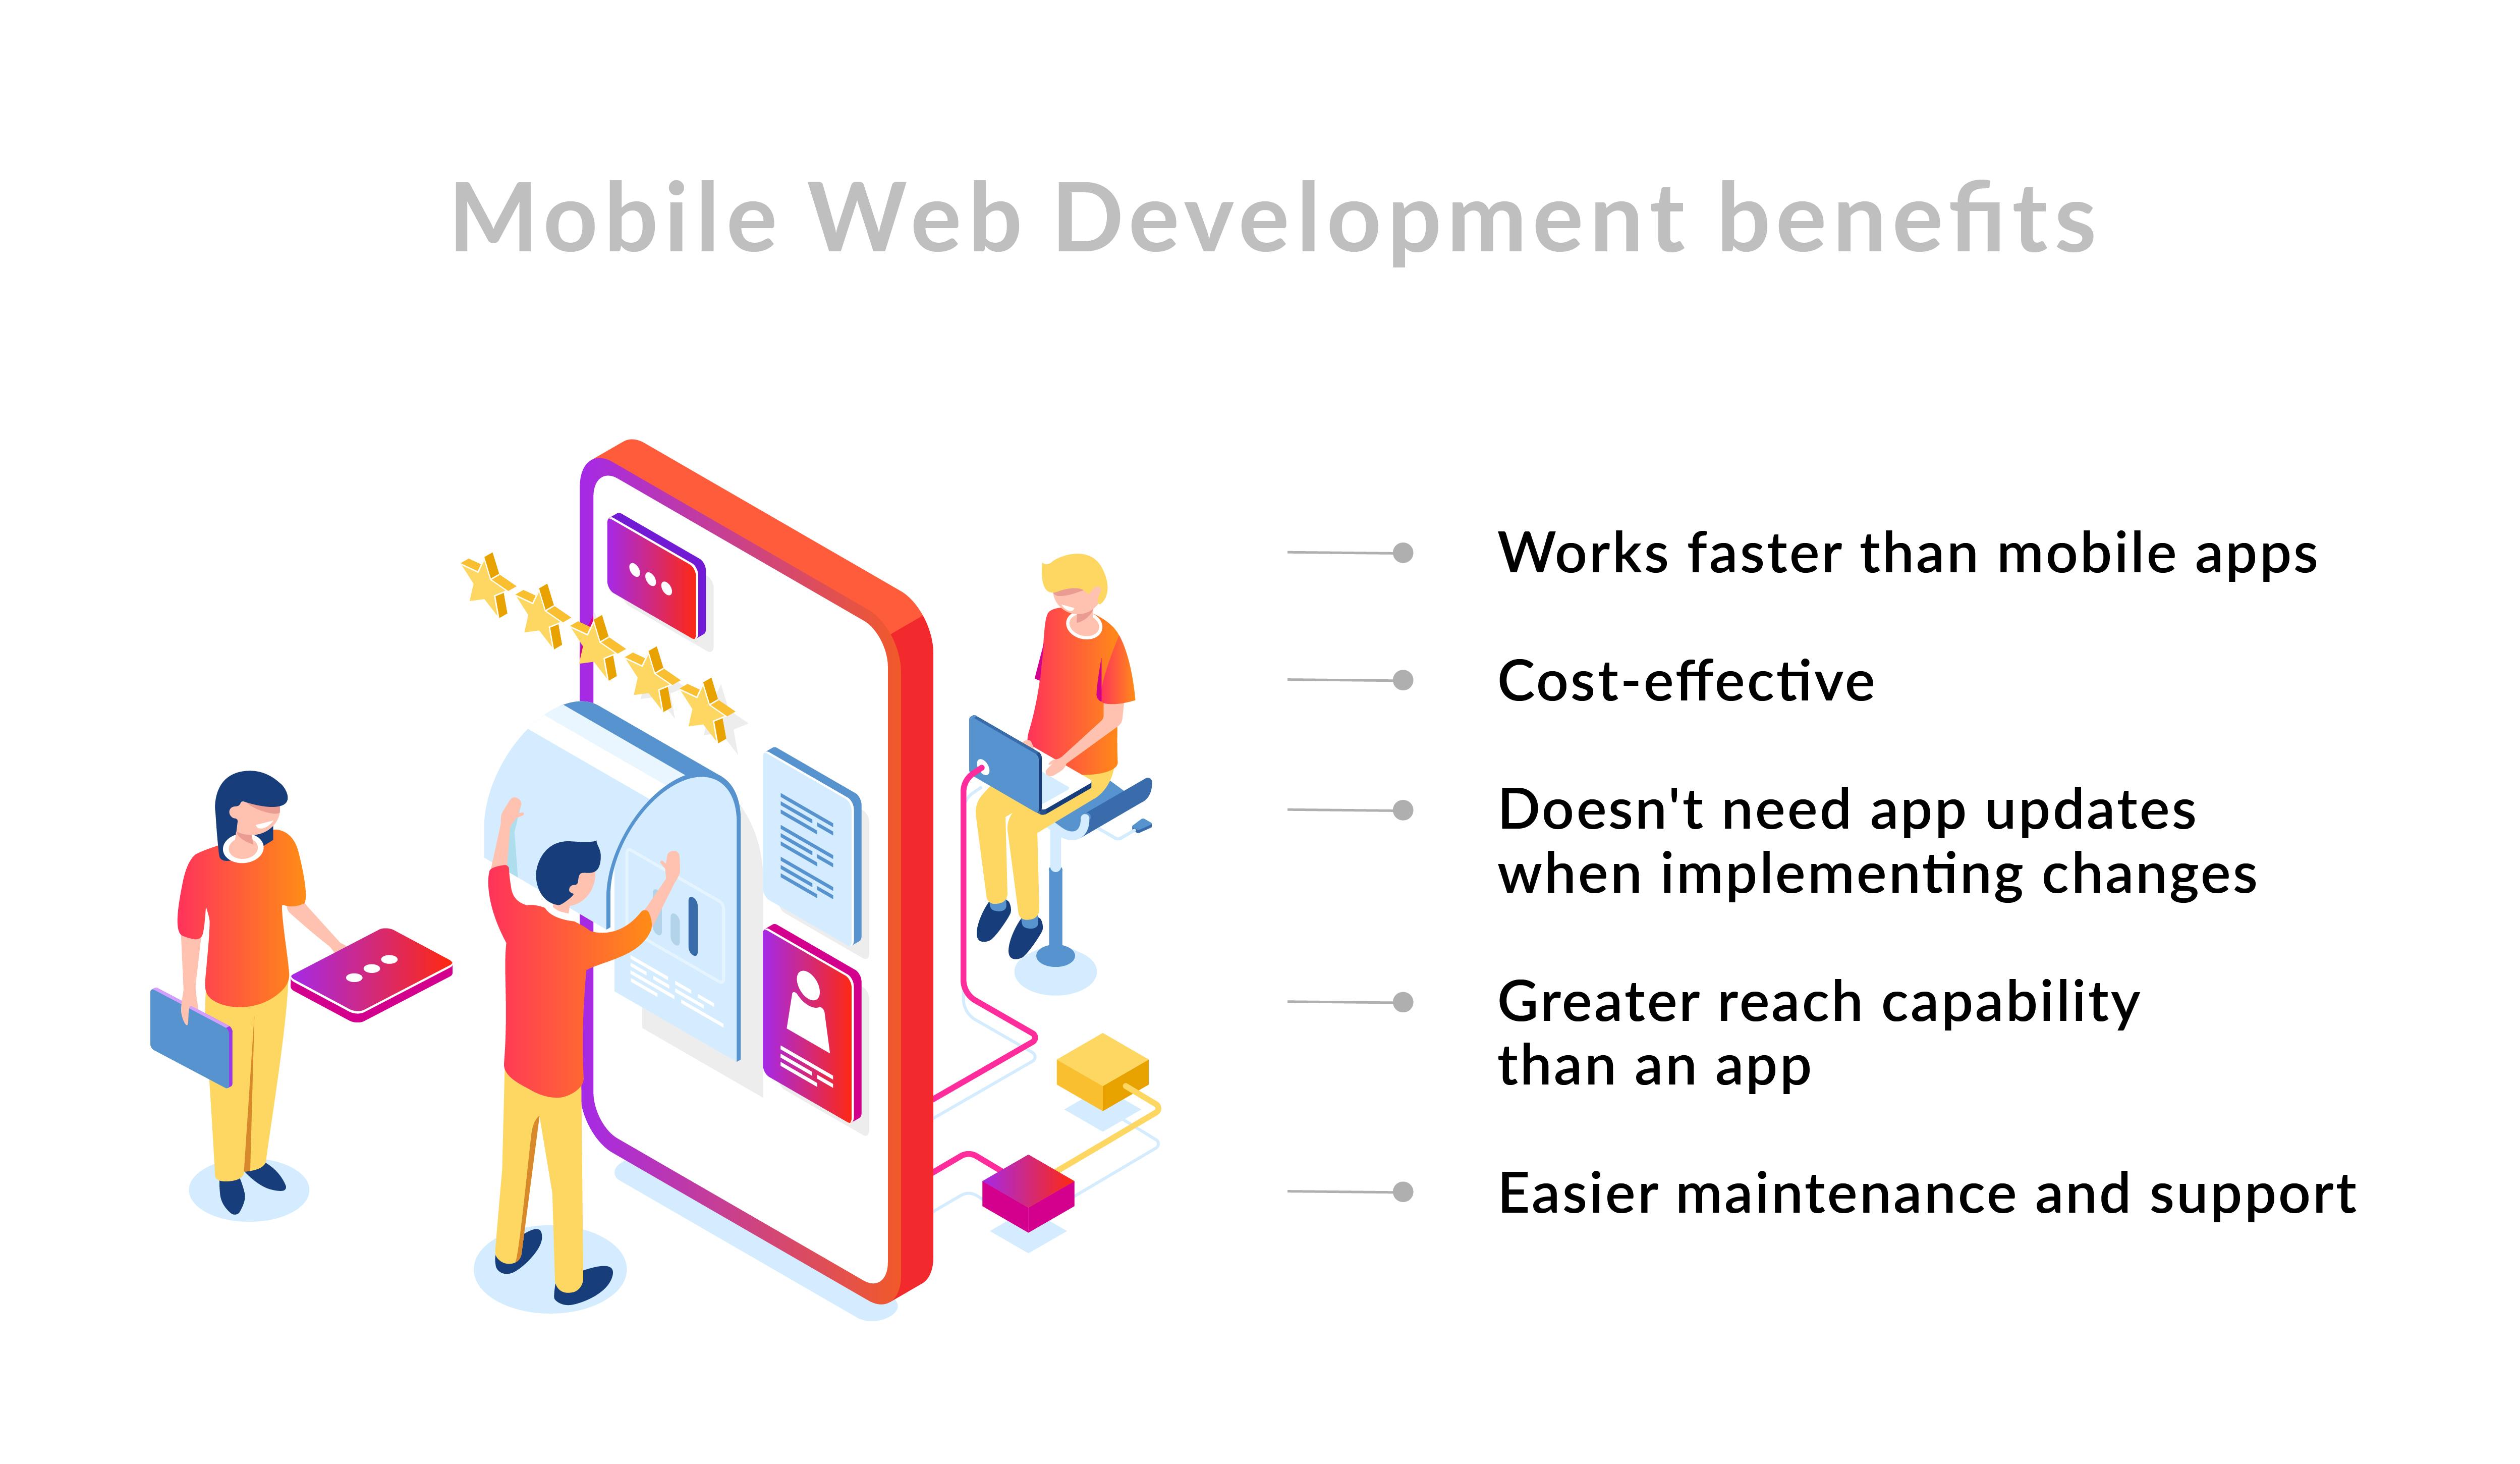 Mobile web development benefits